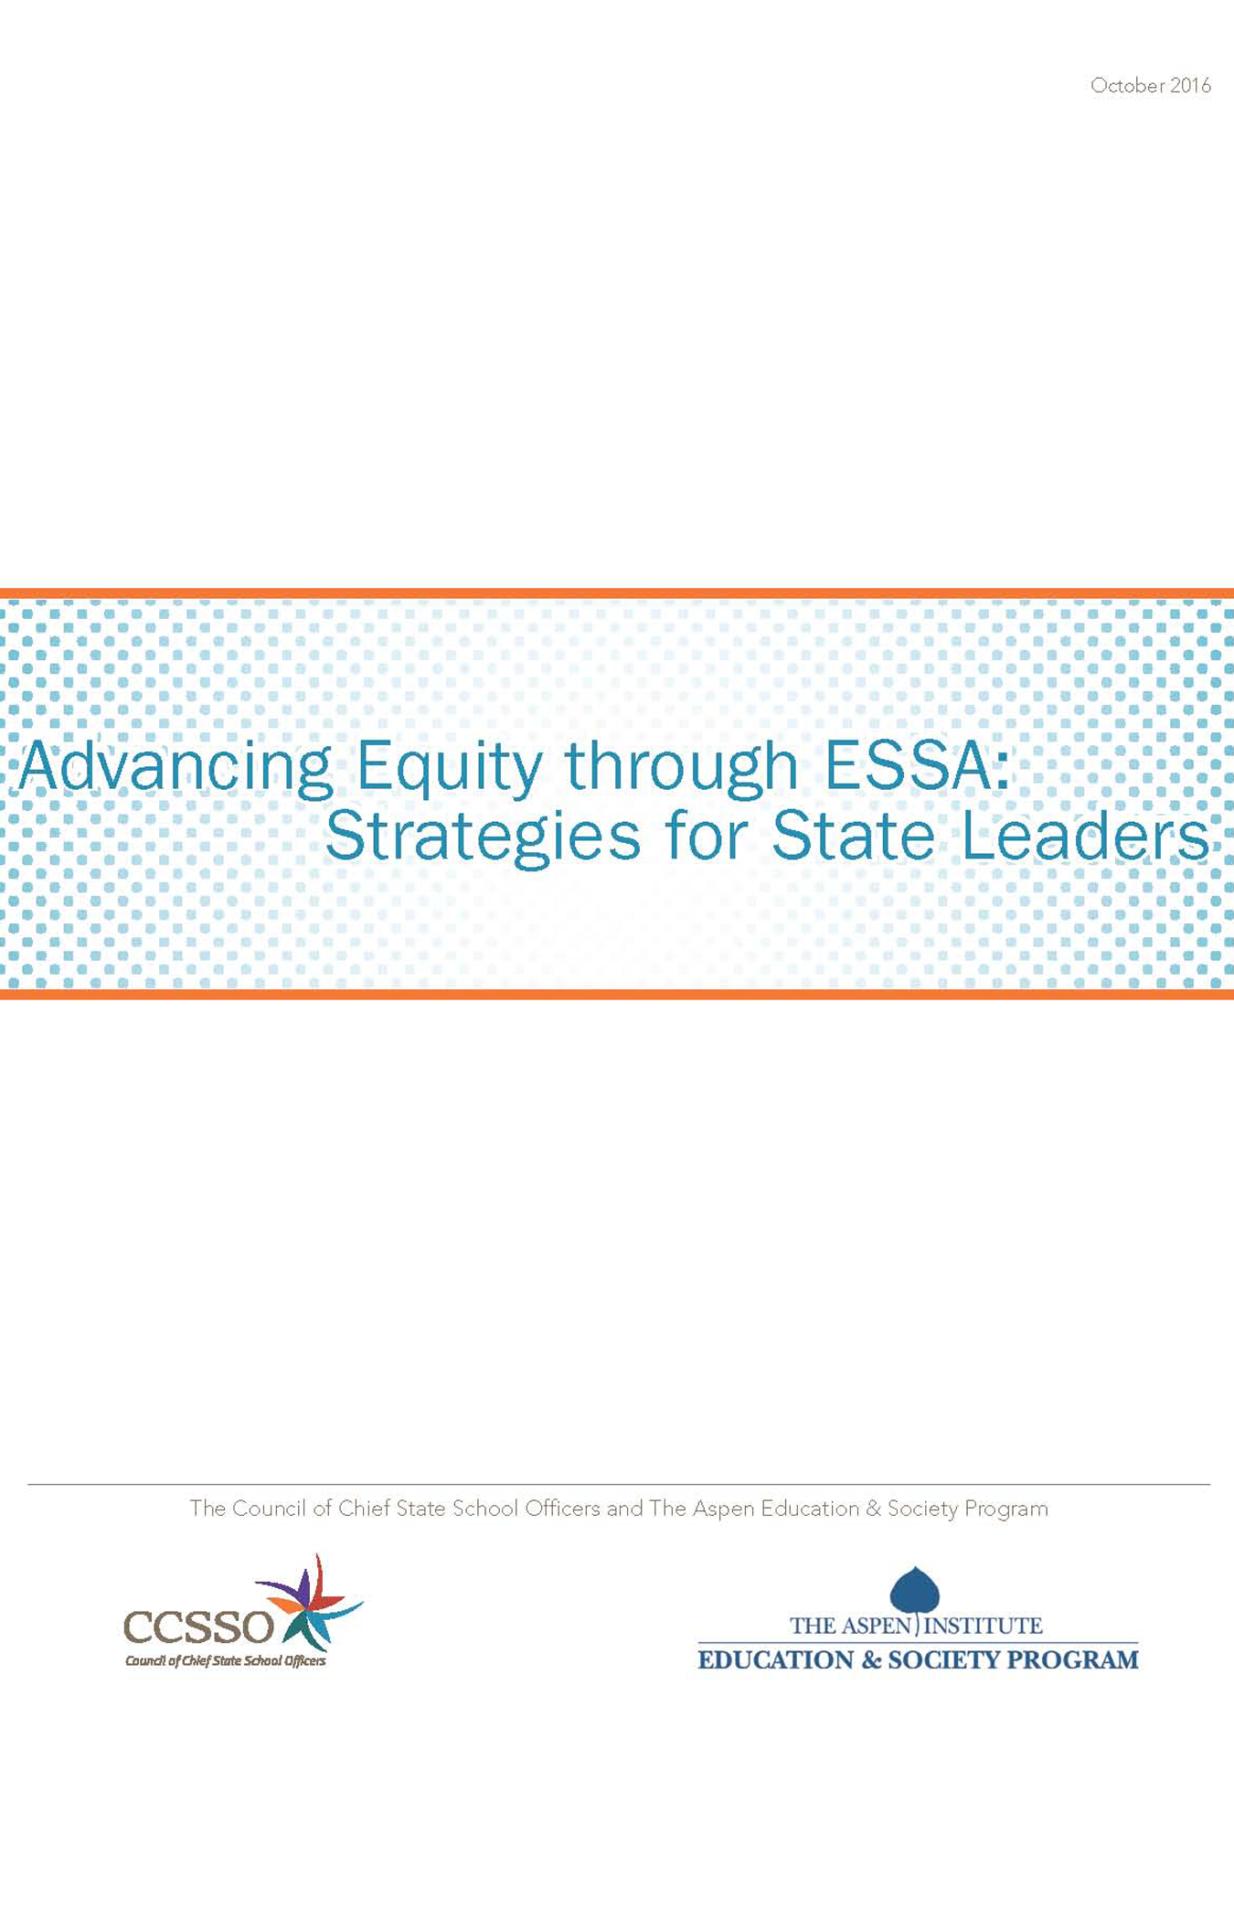 Advancing Equity through ESSA